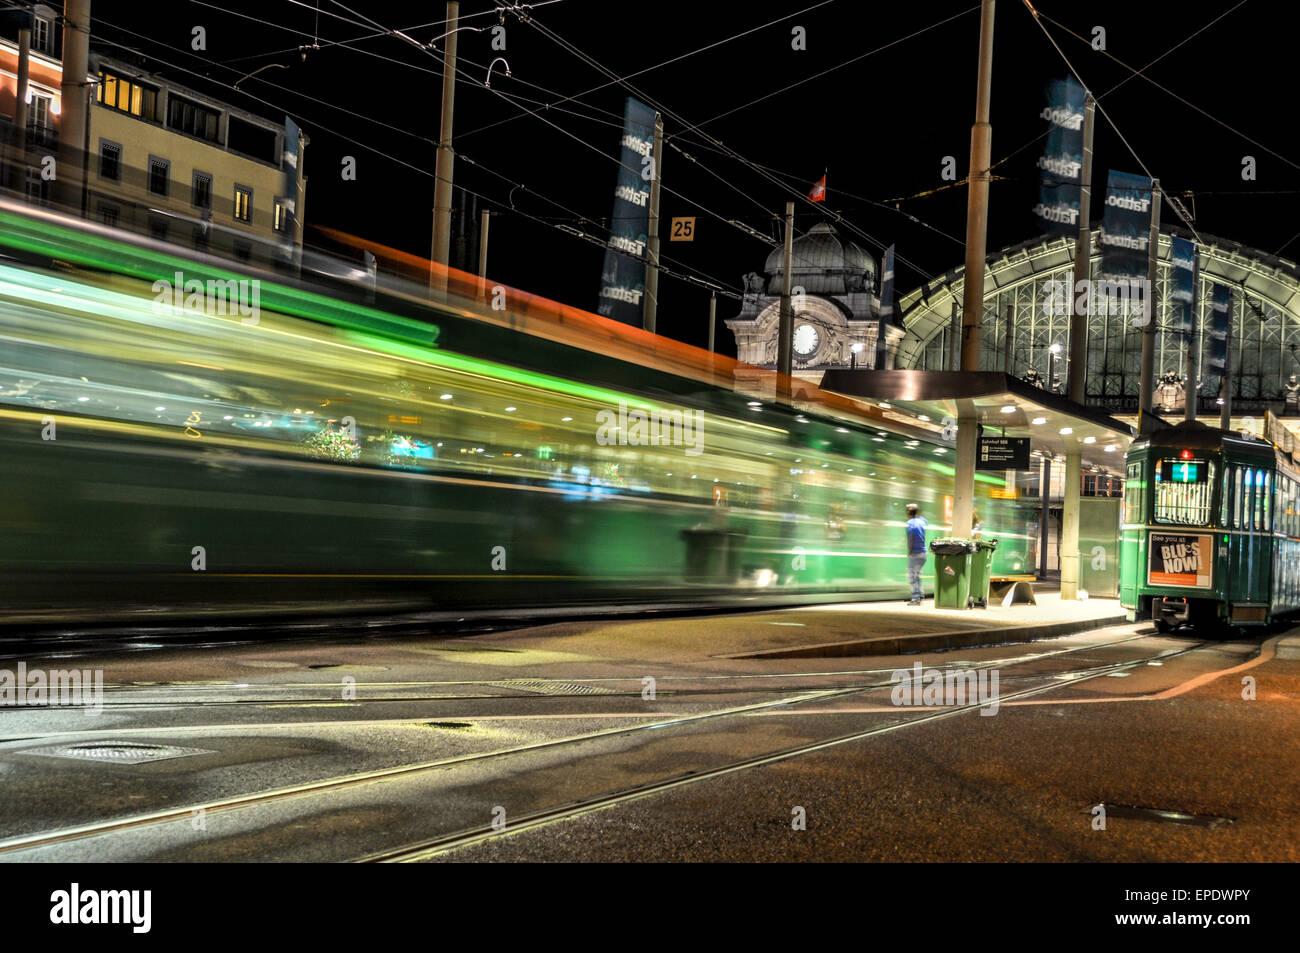 green-tram-approaching-the-platform-in-f